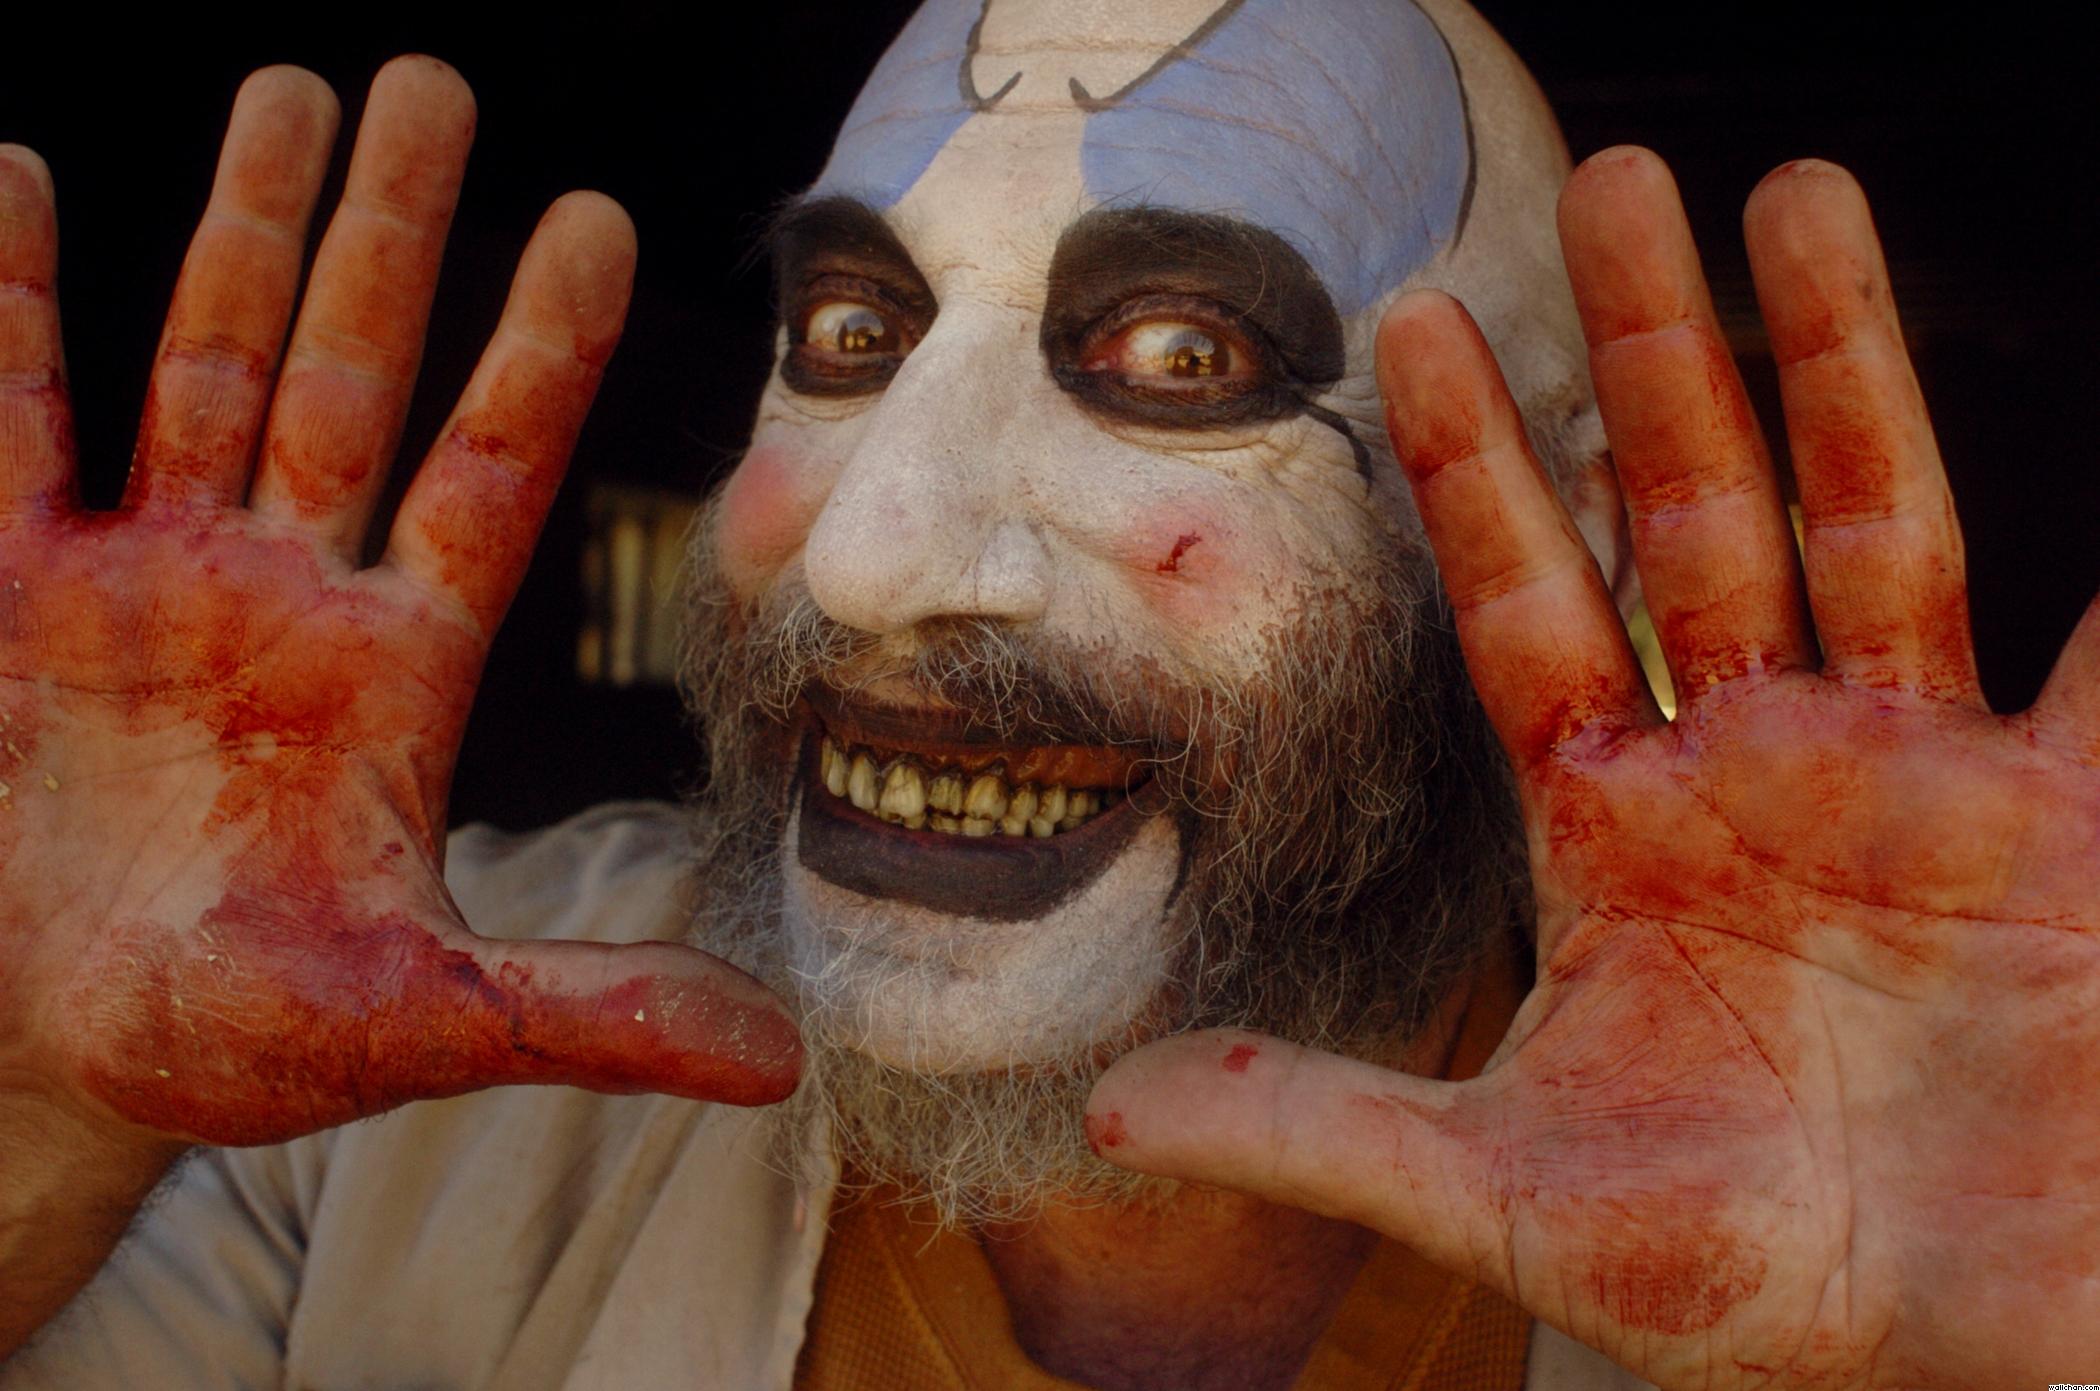 http://images.wikia.com/deadliestfiction/images/6/6d/Captain_Spaulding.jpg